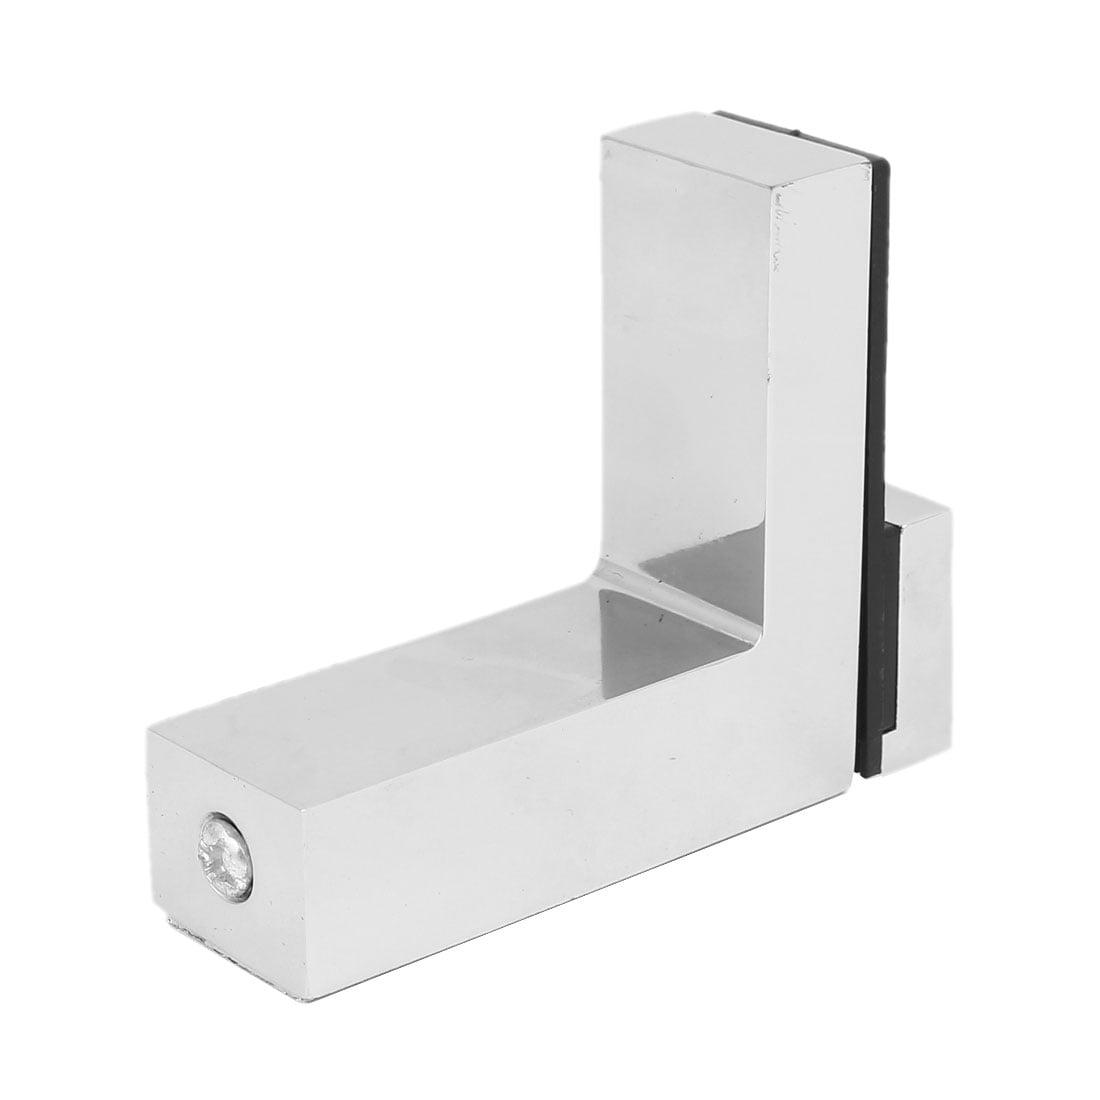 Wall Cabinet Metal Adjustable Glass Clip Shelf Clamp Support Bracket Holder - image 1 of 6